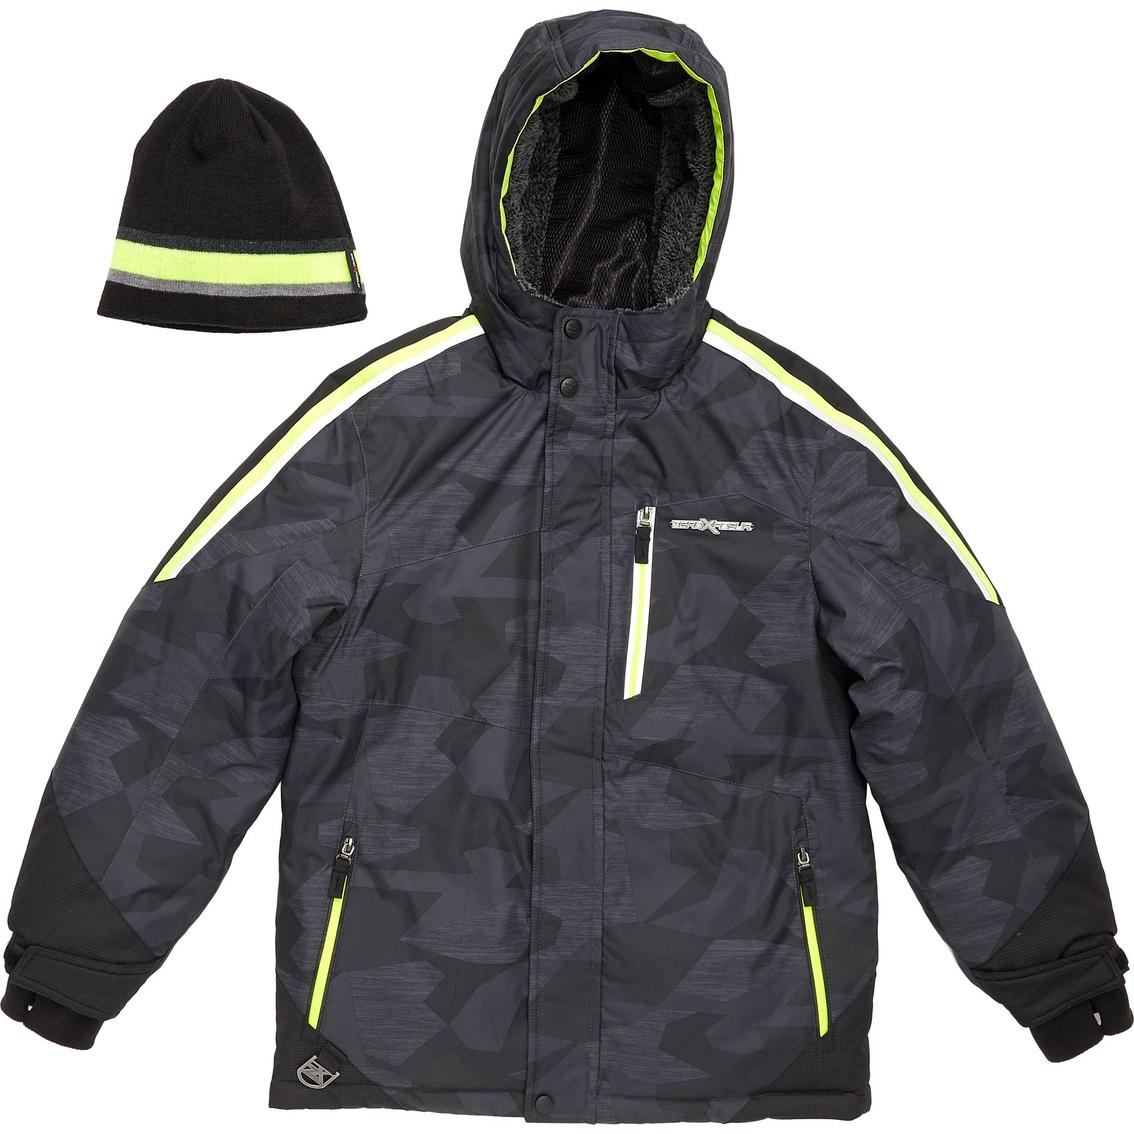 9b3e5fea0 Zero Xposur Boys Spear Snowboard Jacket